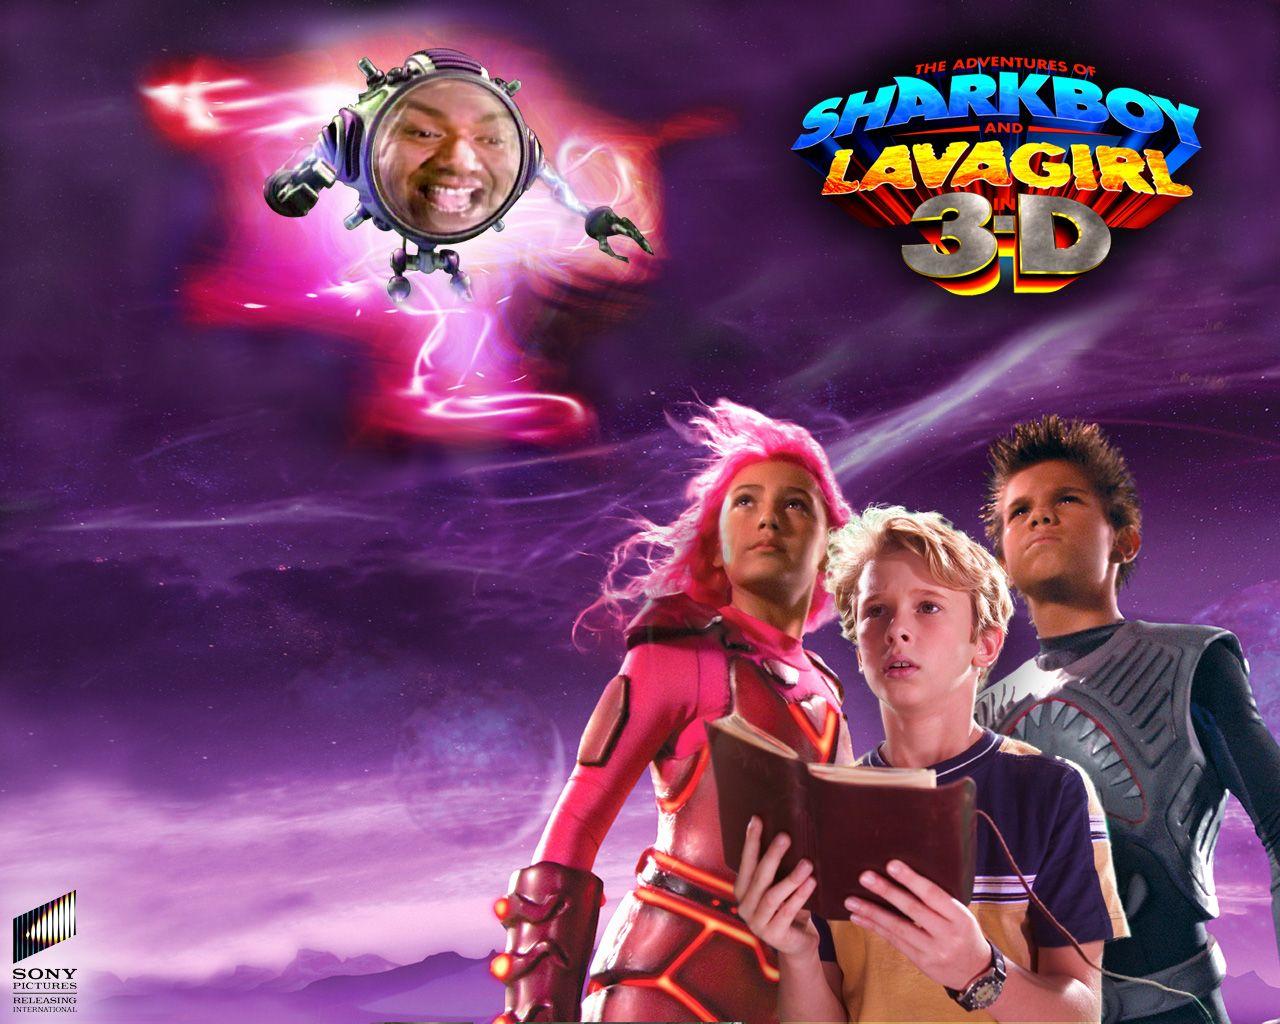 sharkboy and lavagirl full movie in tamil